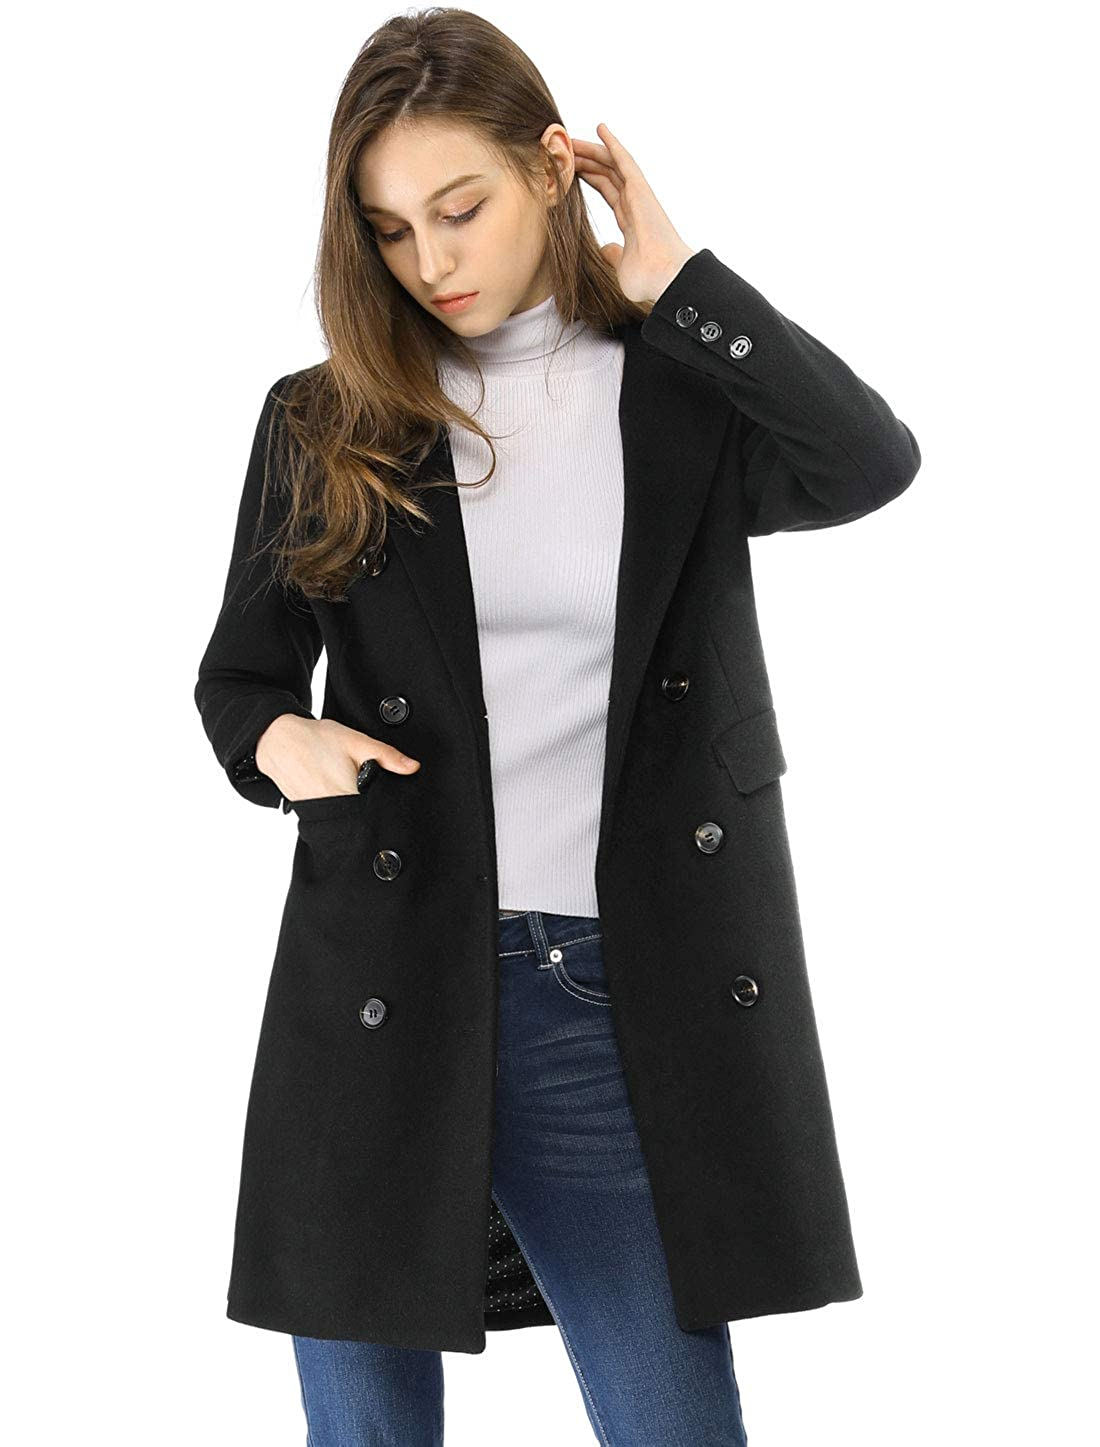 0820271bf Amazon.com: Allegra K Women's Long Jacket Notched Lapel Double ...